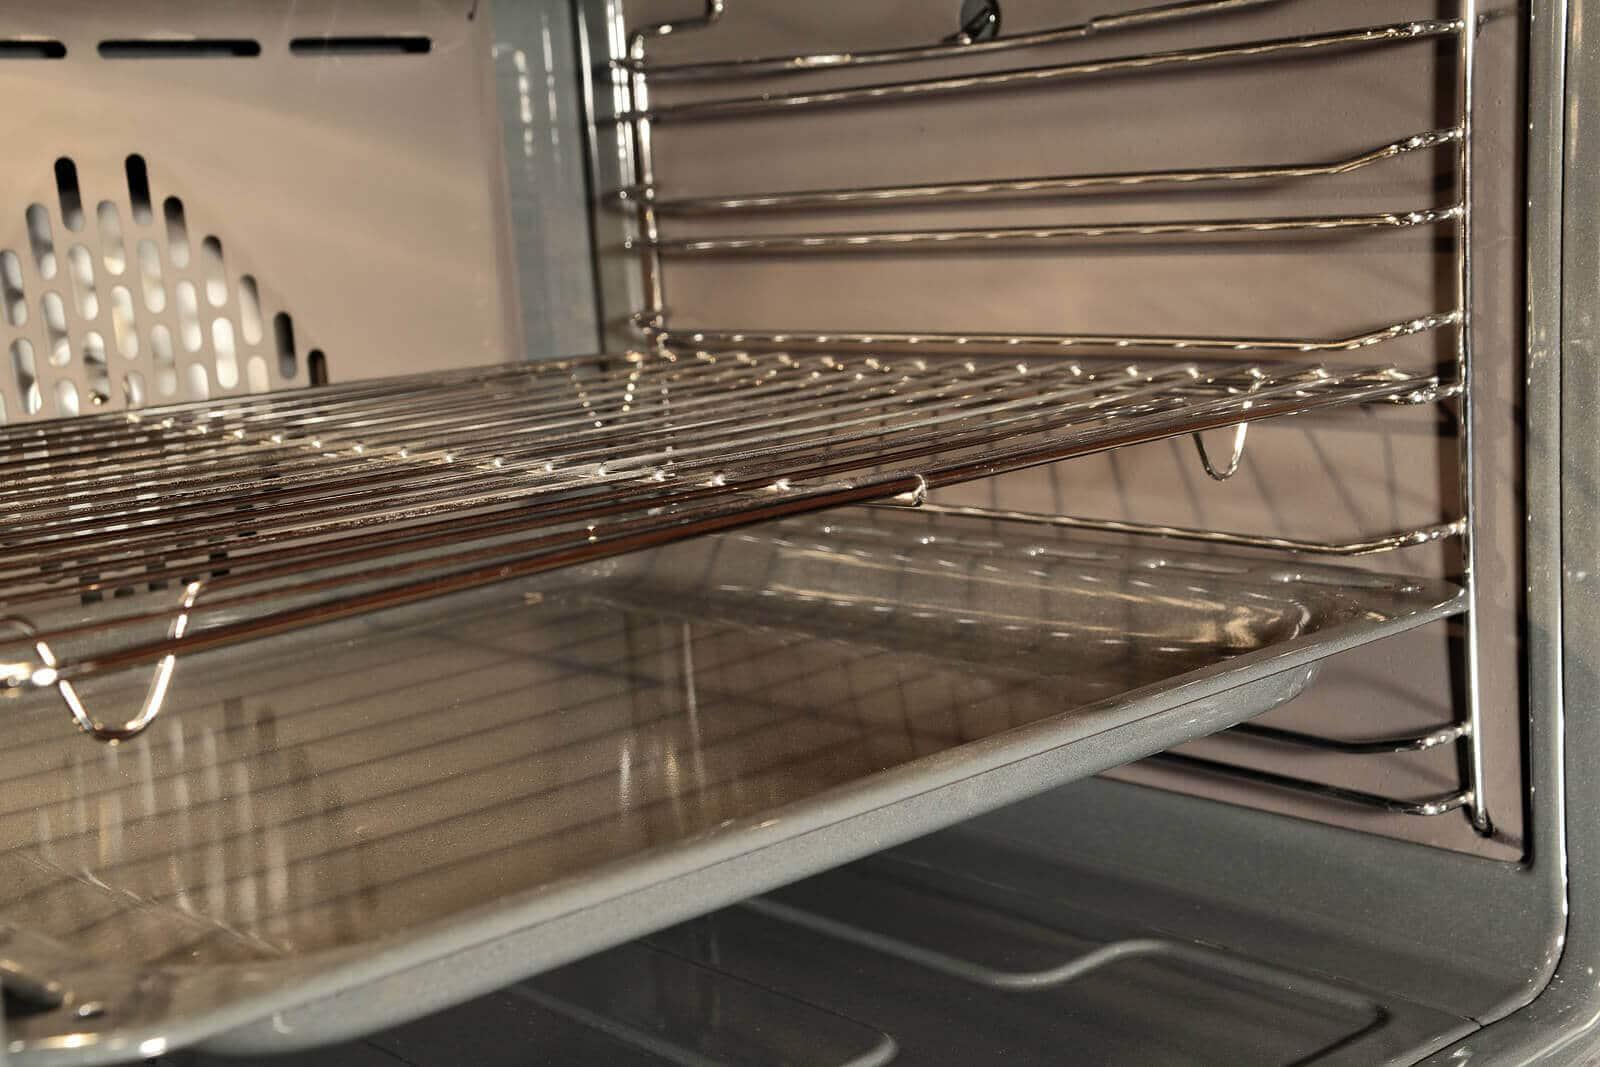 5 Proven Effective Ways To Clean Oven Racks Yourself